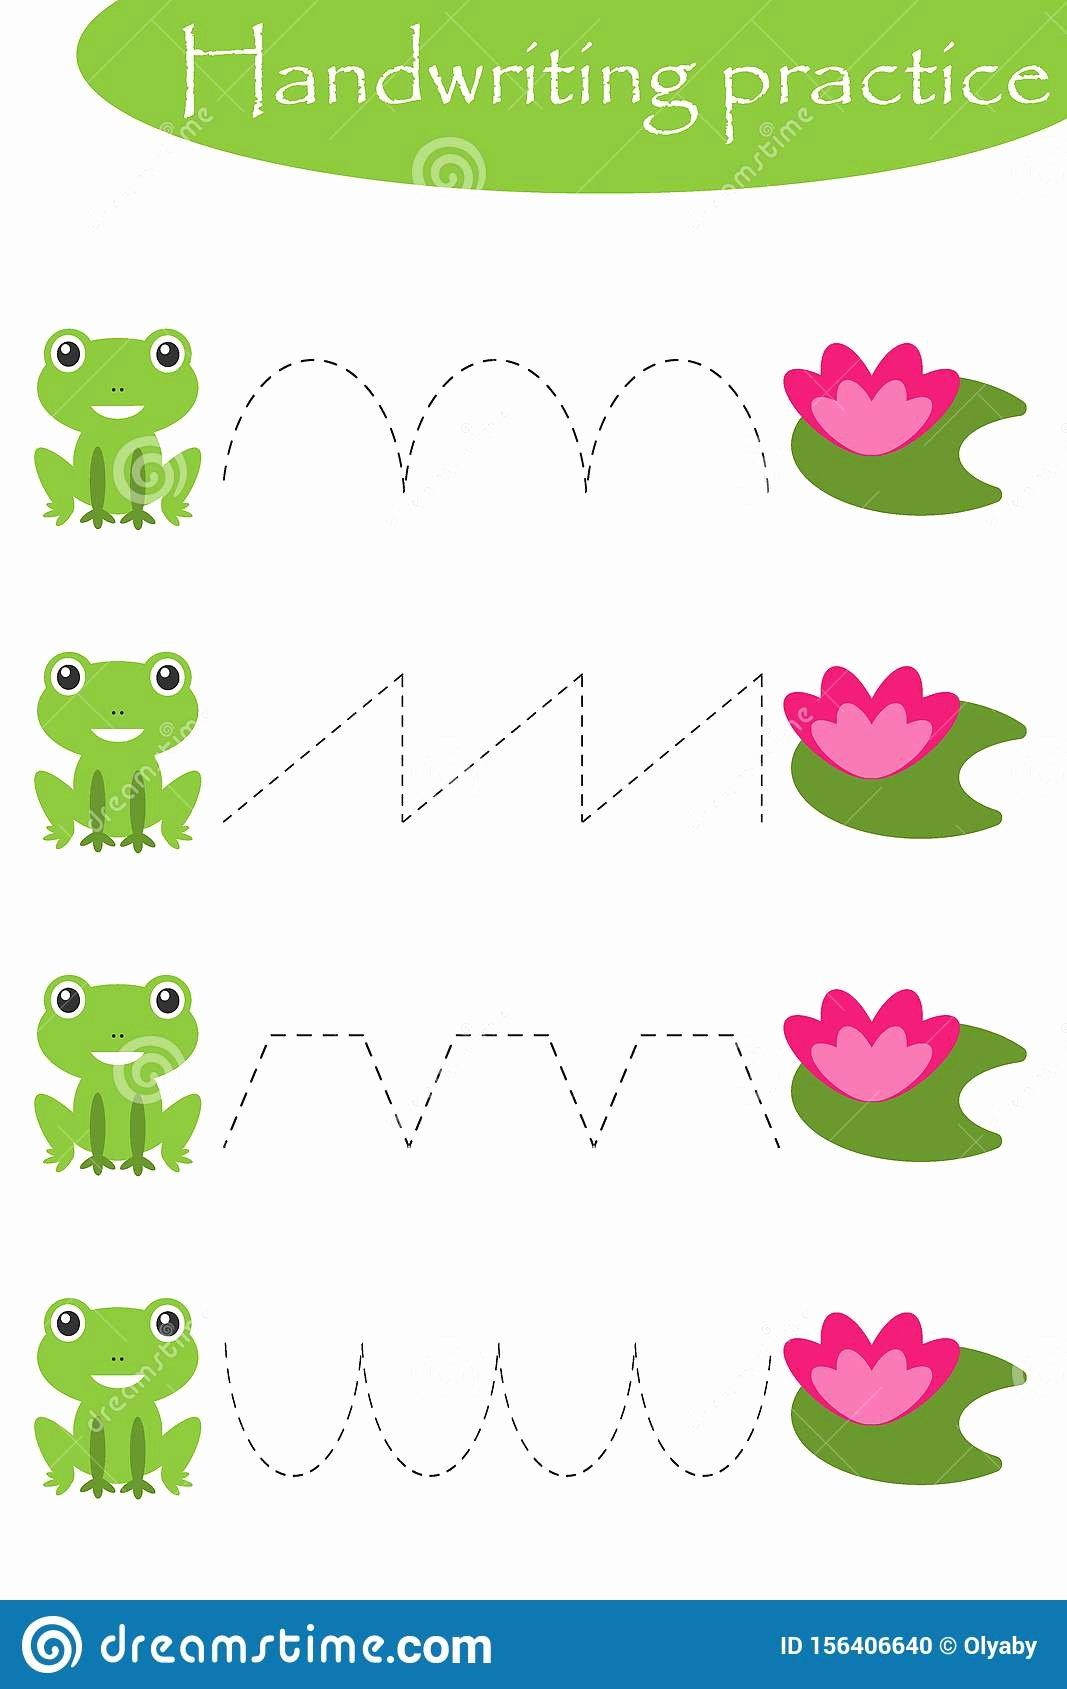 Frog Worksheets for Preschoolers Beautiful Frogs and Water Lilies Handwriting Practice Sheet Kids